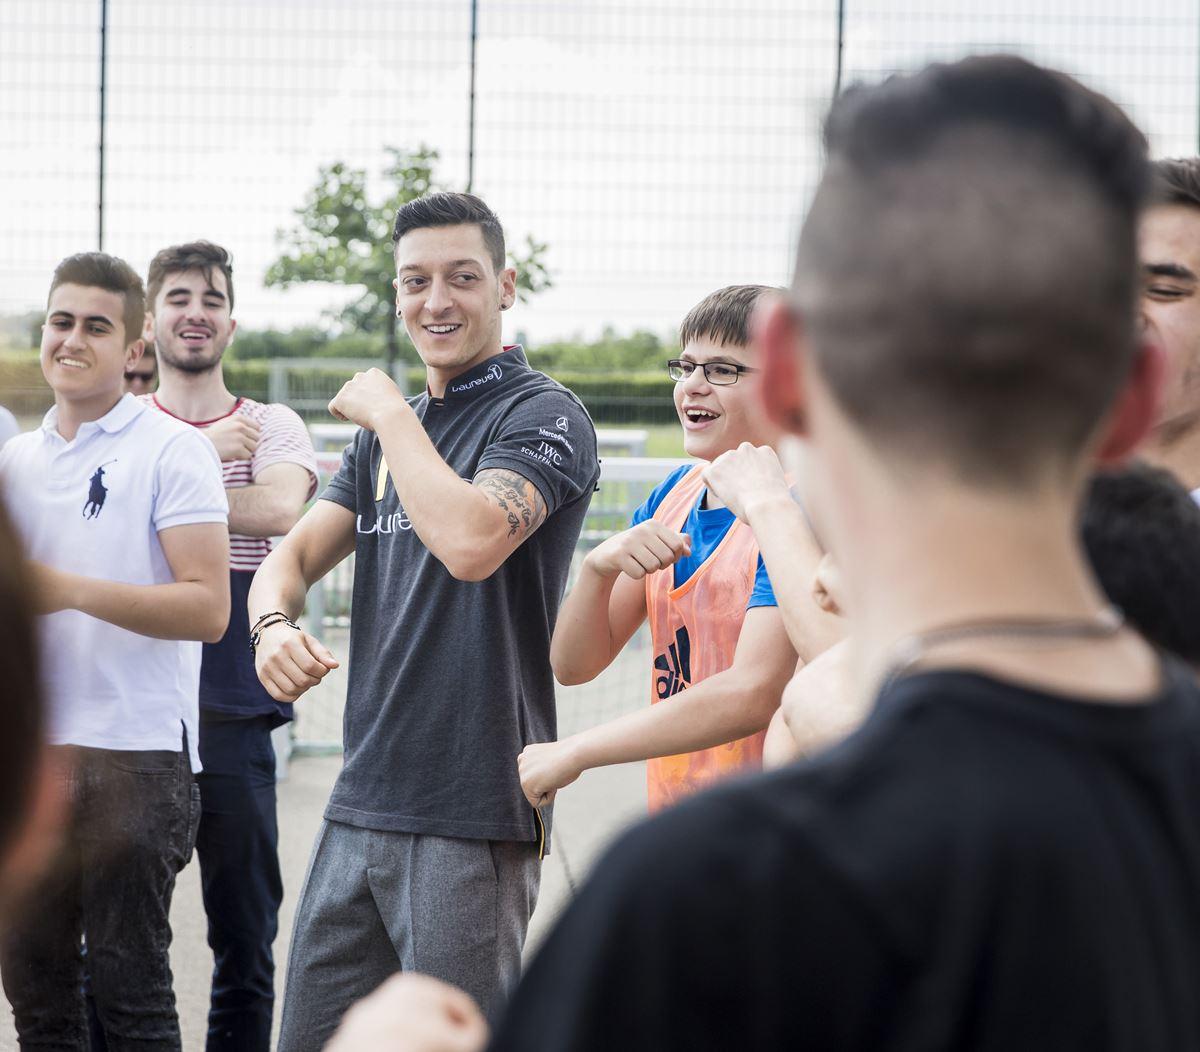 Mesut Özil soziales Sportprojekt KICKFORMORE Laureus Sport for Good